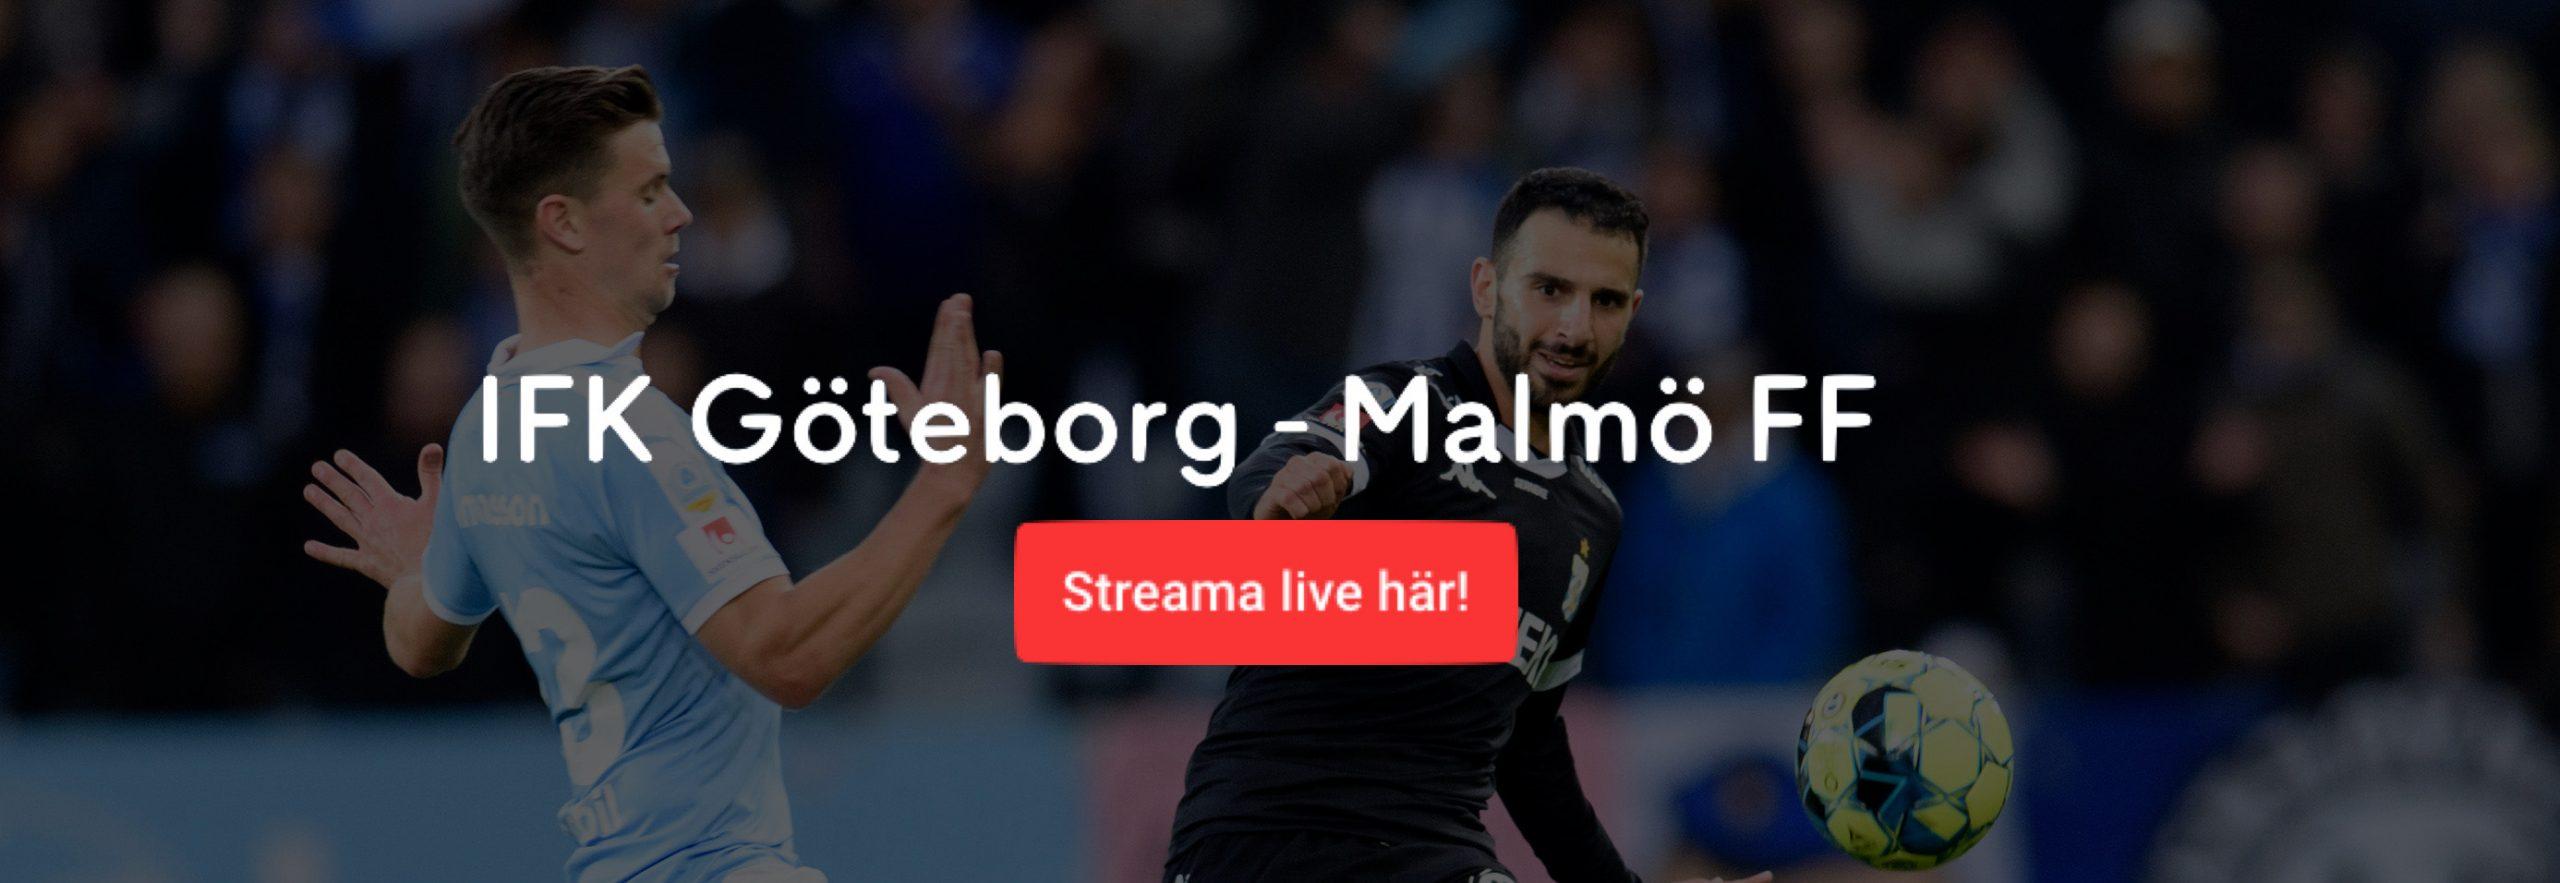 Malmö FF IFK Göteborg live stream? Streama MFF vs IFK live stream online + TV-tider!